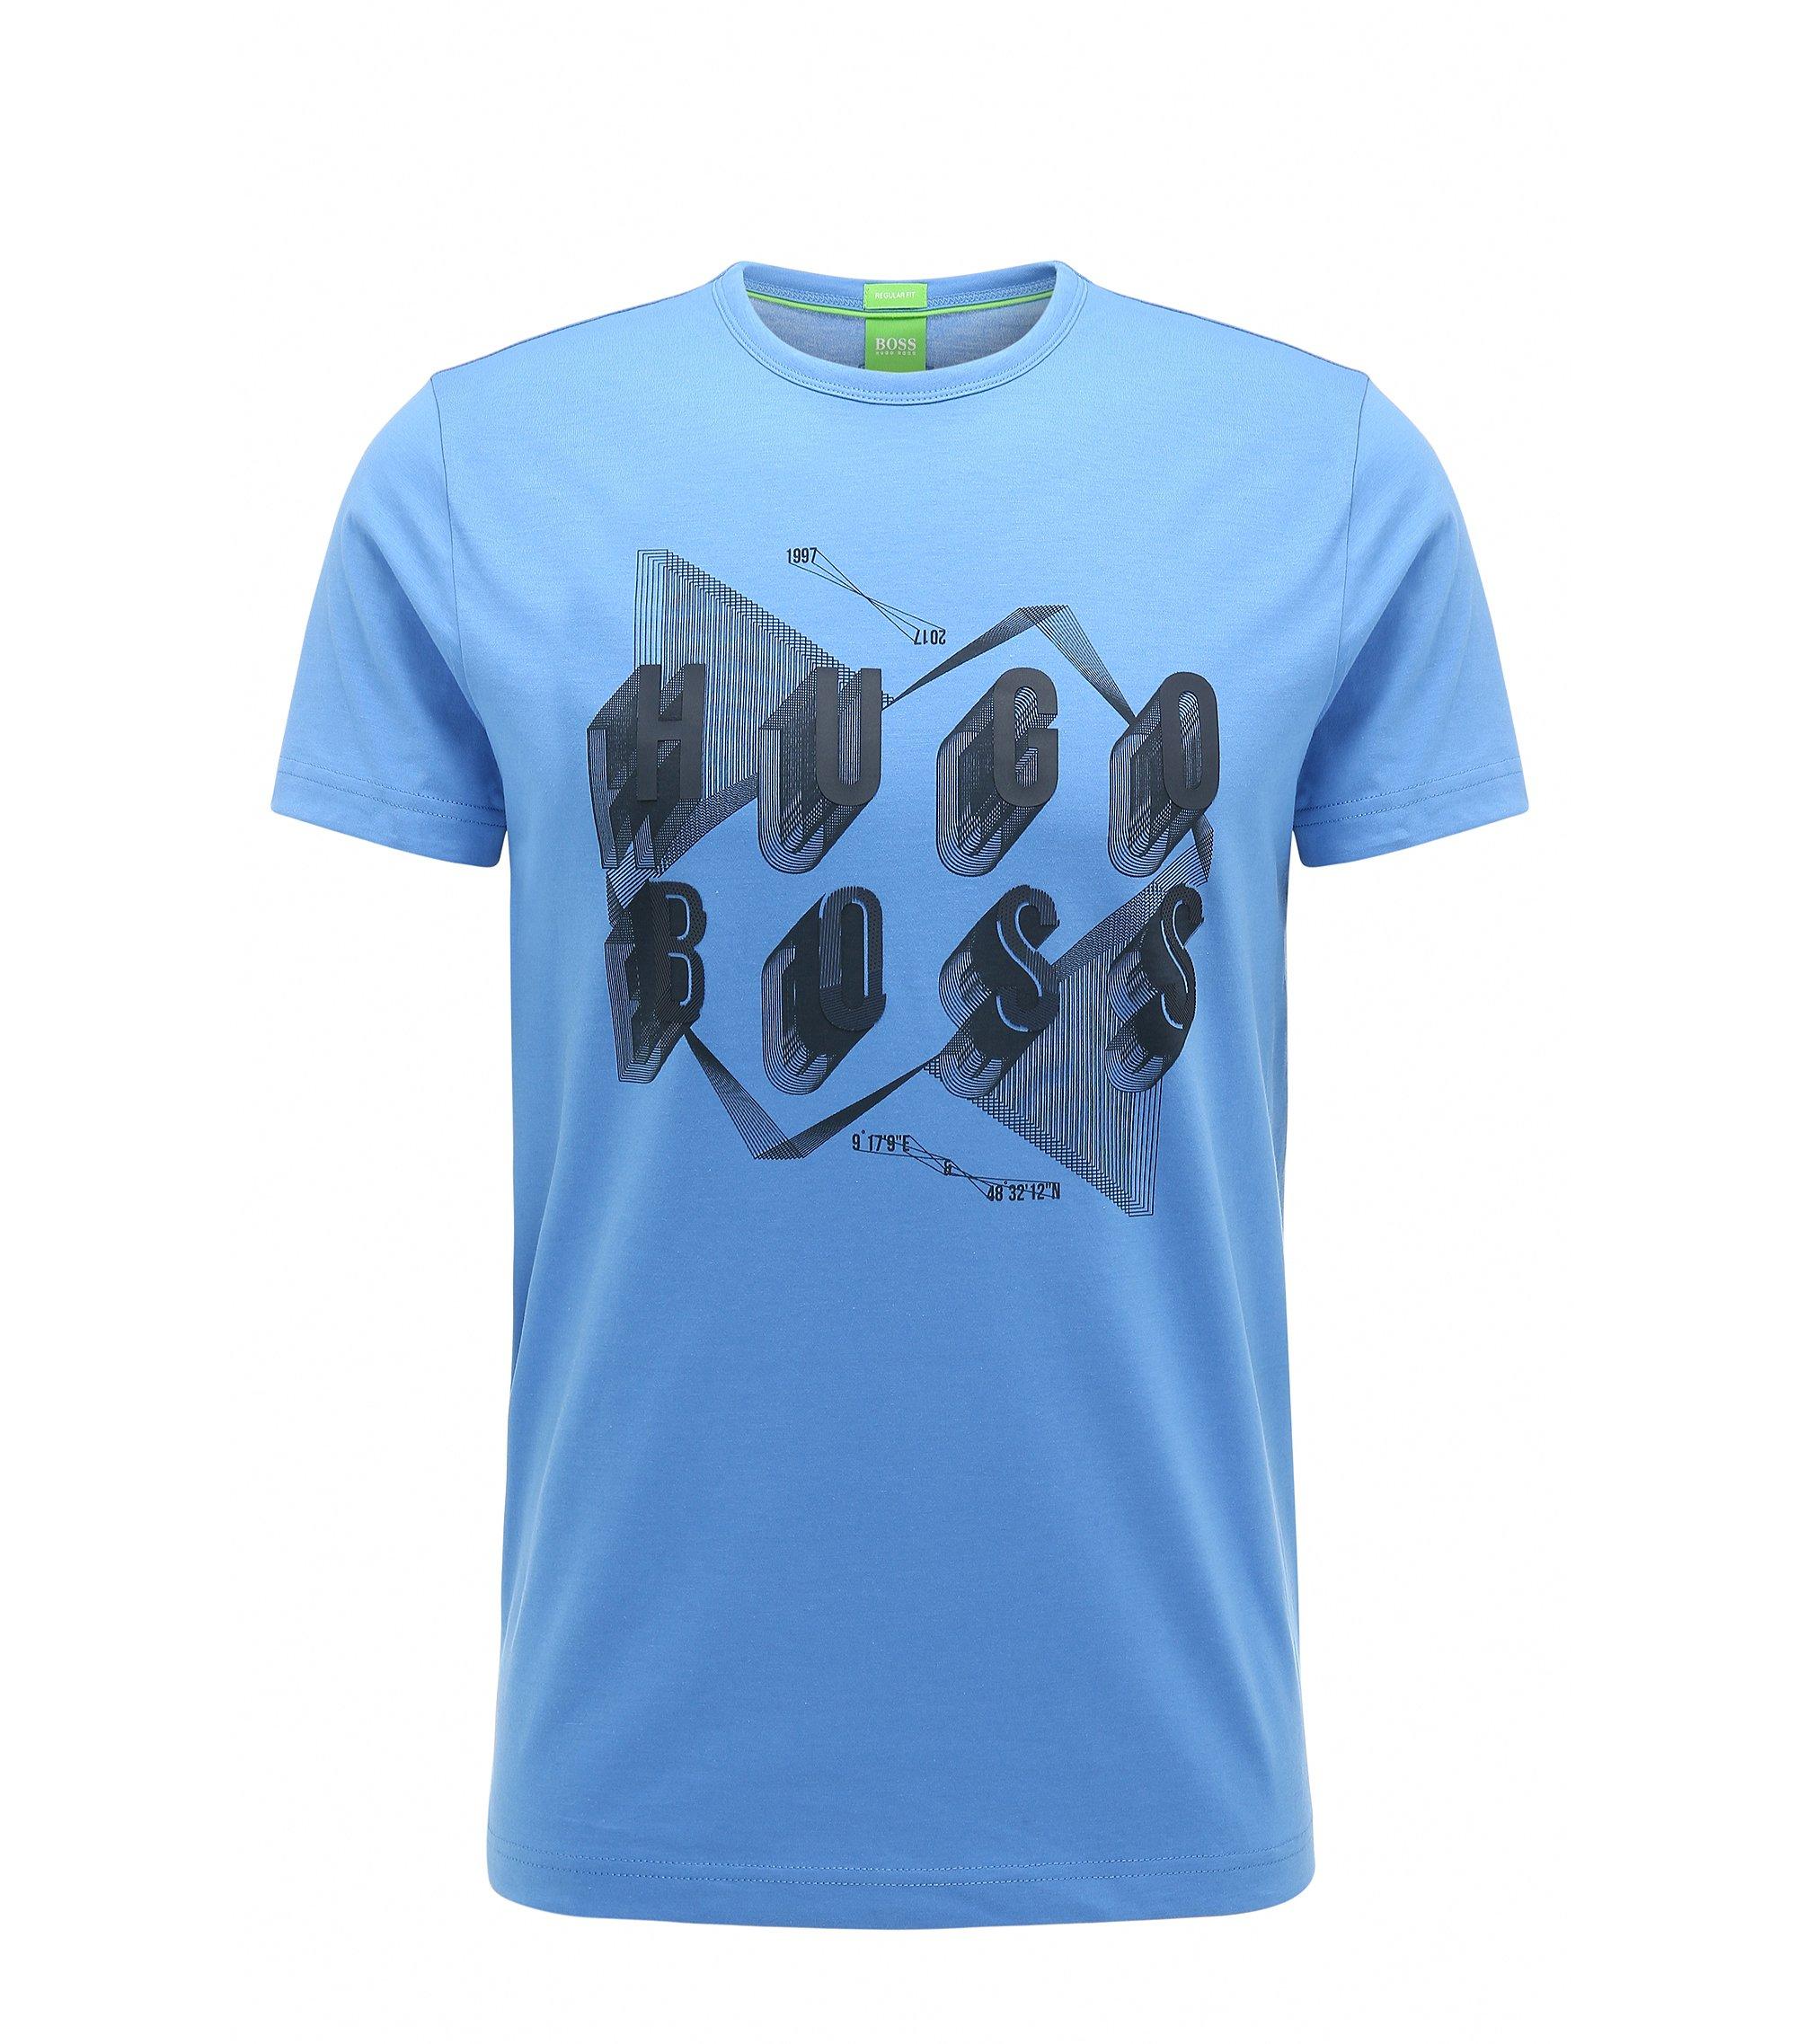 Cotton Graphic T-Shirt | Teeos, Blue